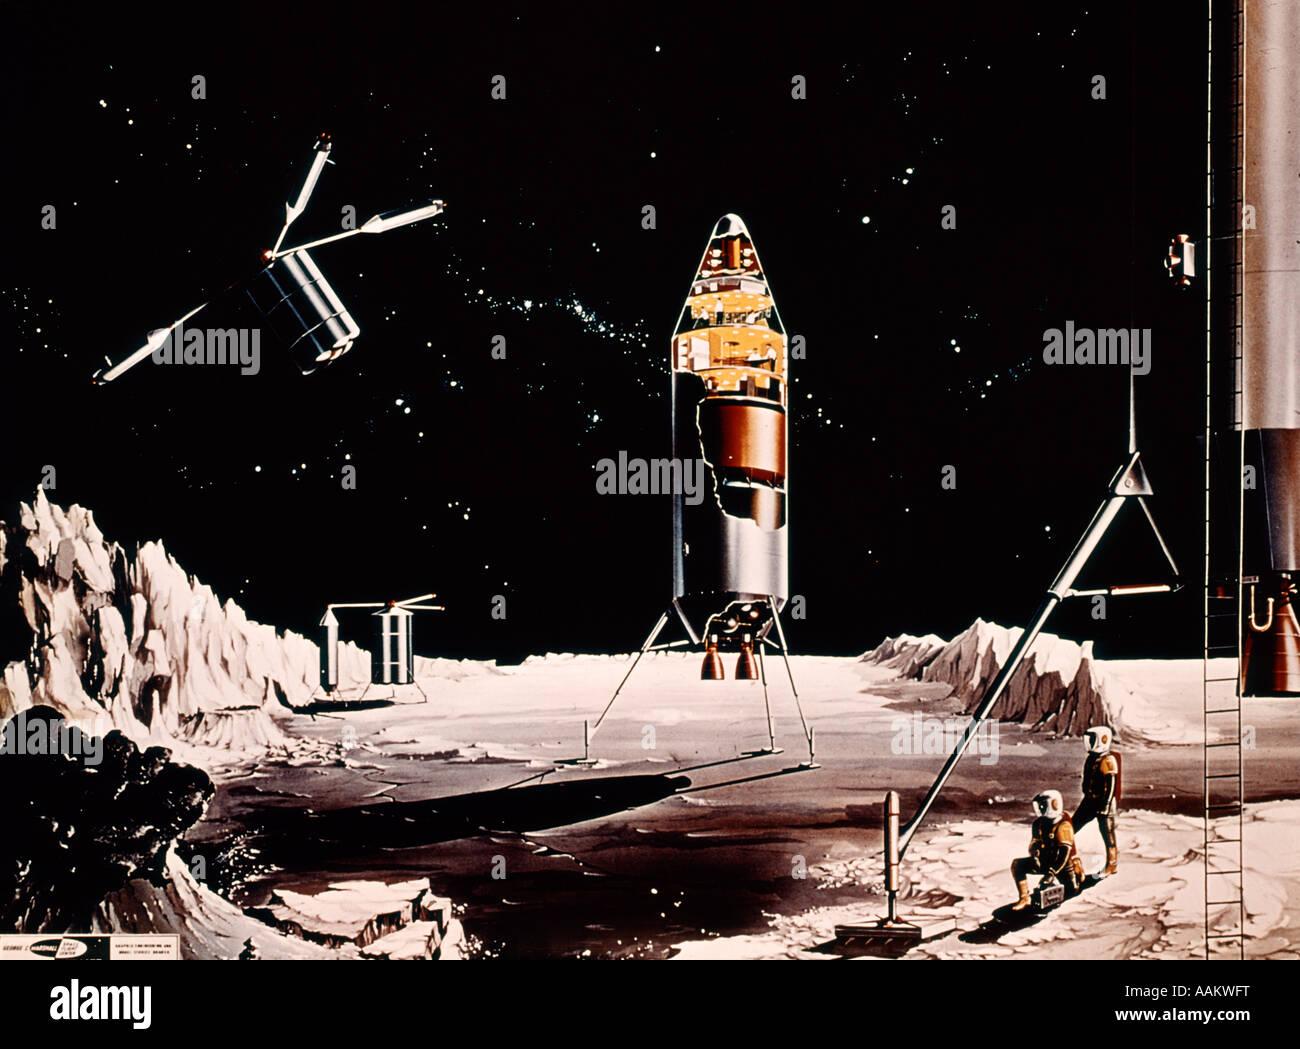 1960s FANTASY ILLUSTRATION LUNAR LANDING EXPLORATION MOON ASTRONAUTS SATELLITE ROCKET SCI-FI SCIENCE FICTION - Stock Image